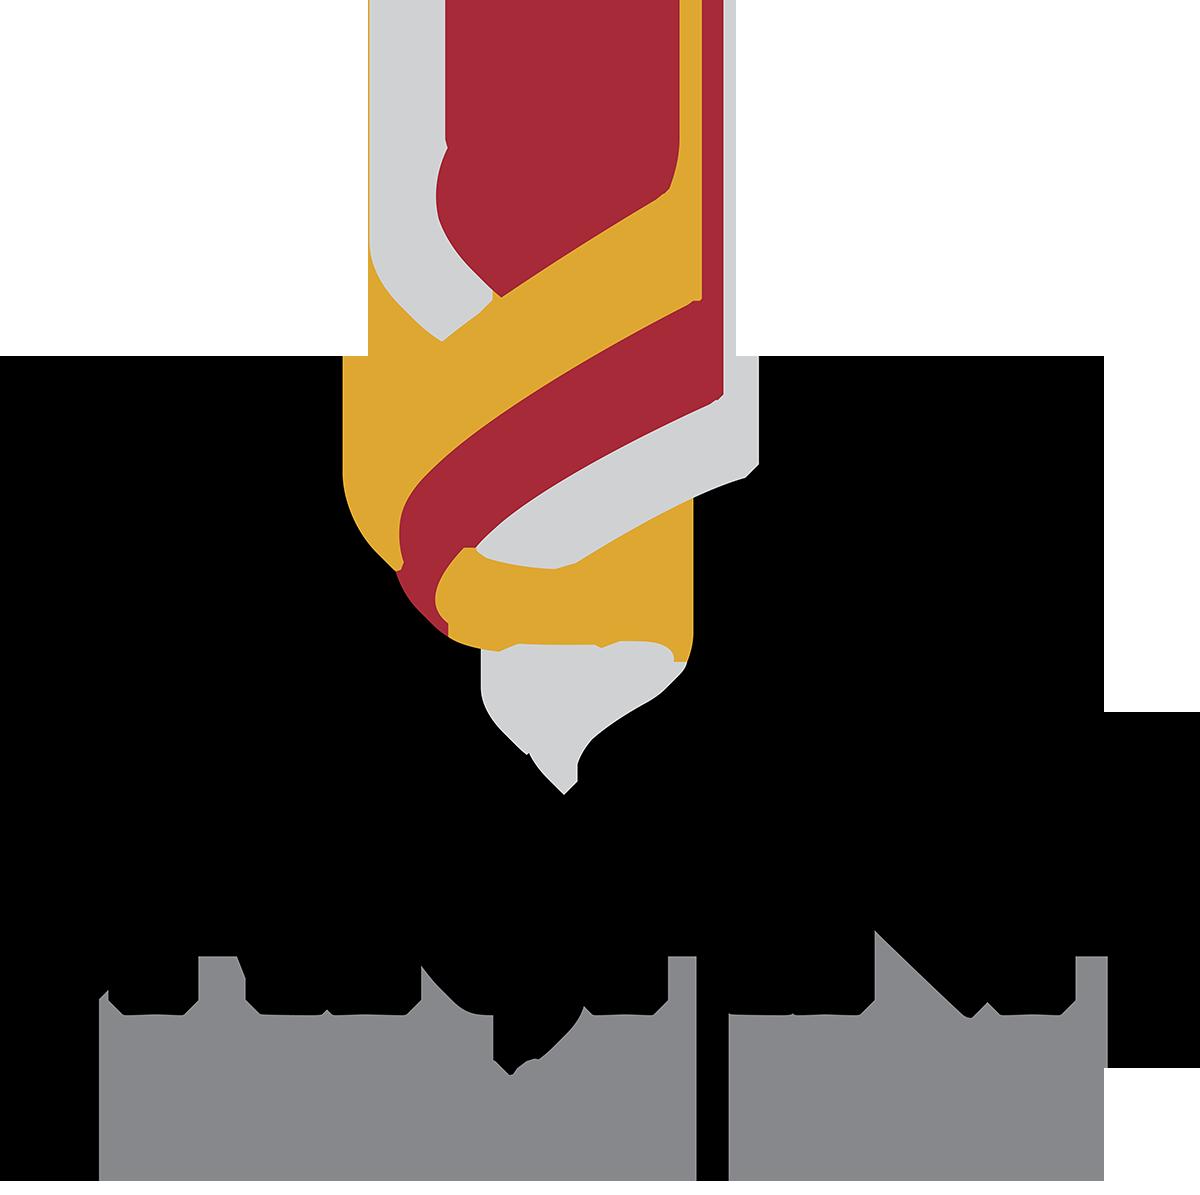 Sarjana Education Group